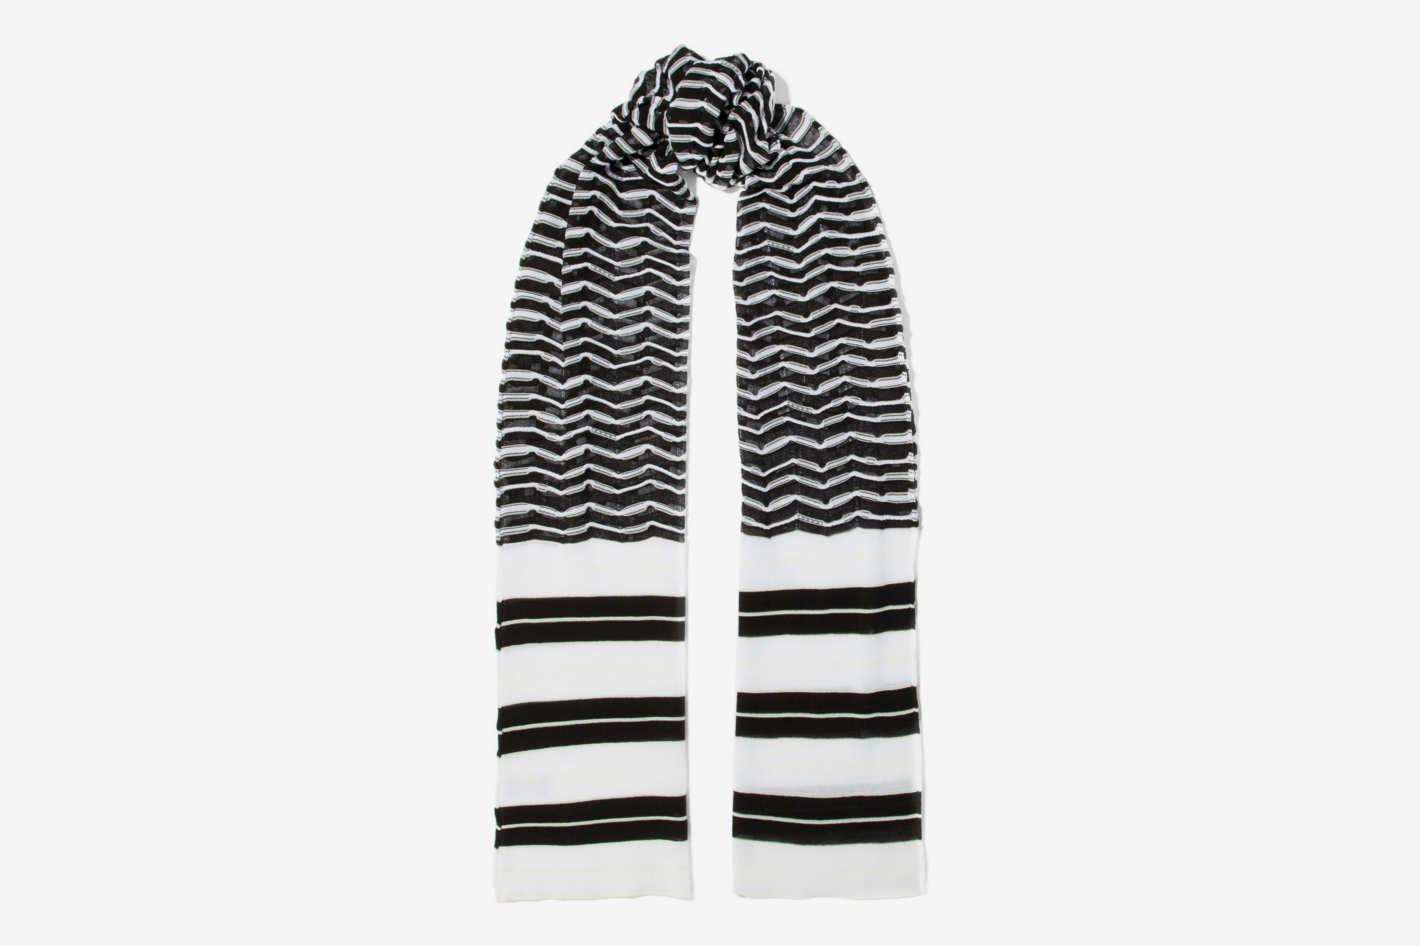 M Missoni Crochet Cotton-Blend Scarf